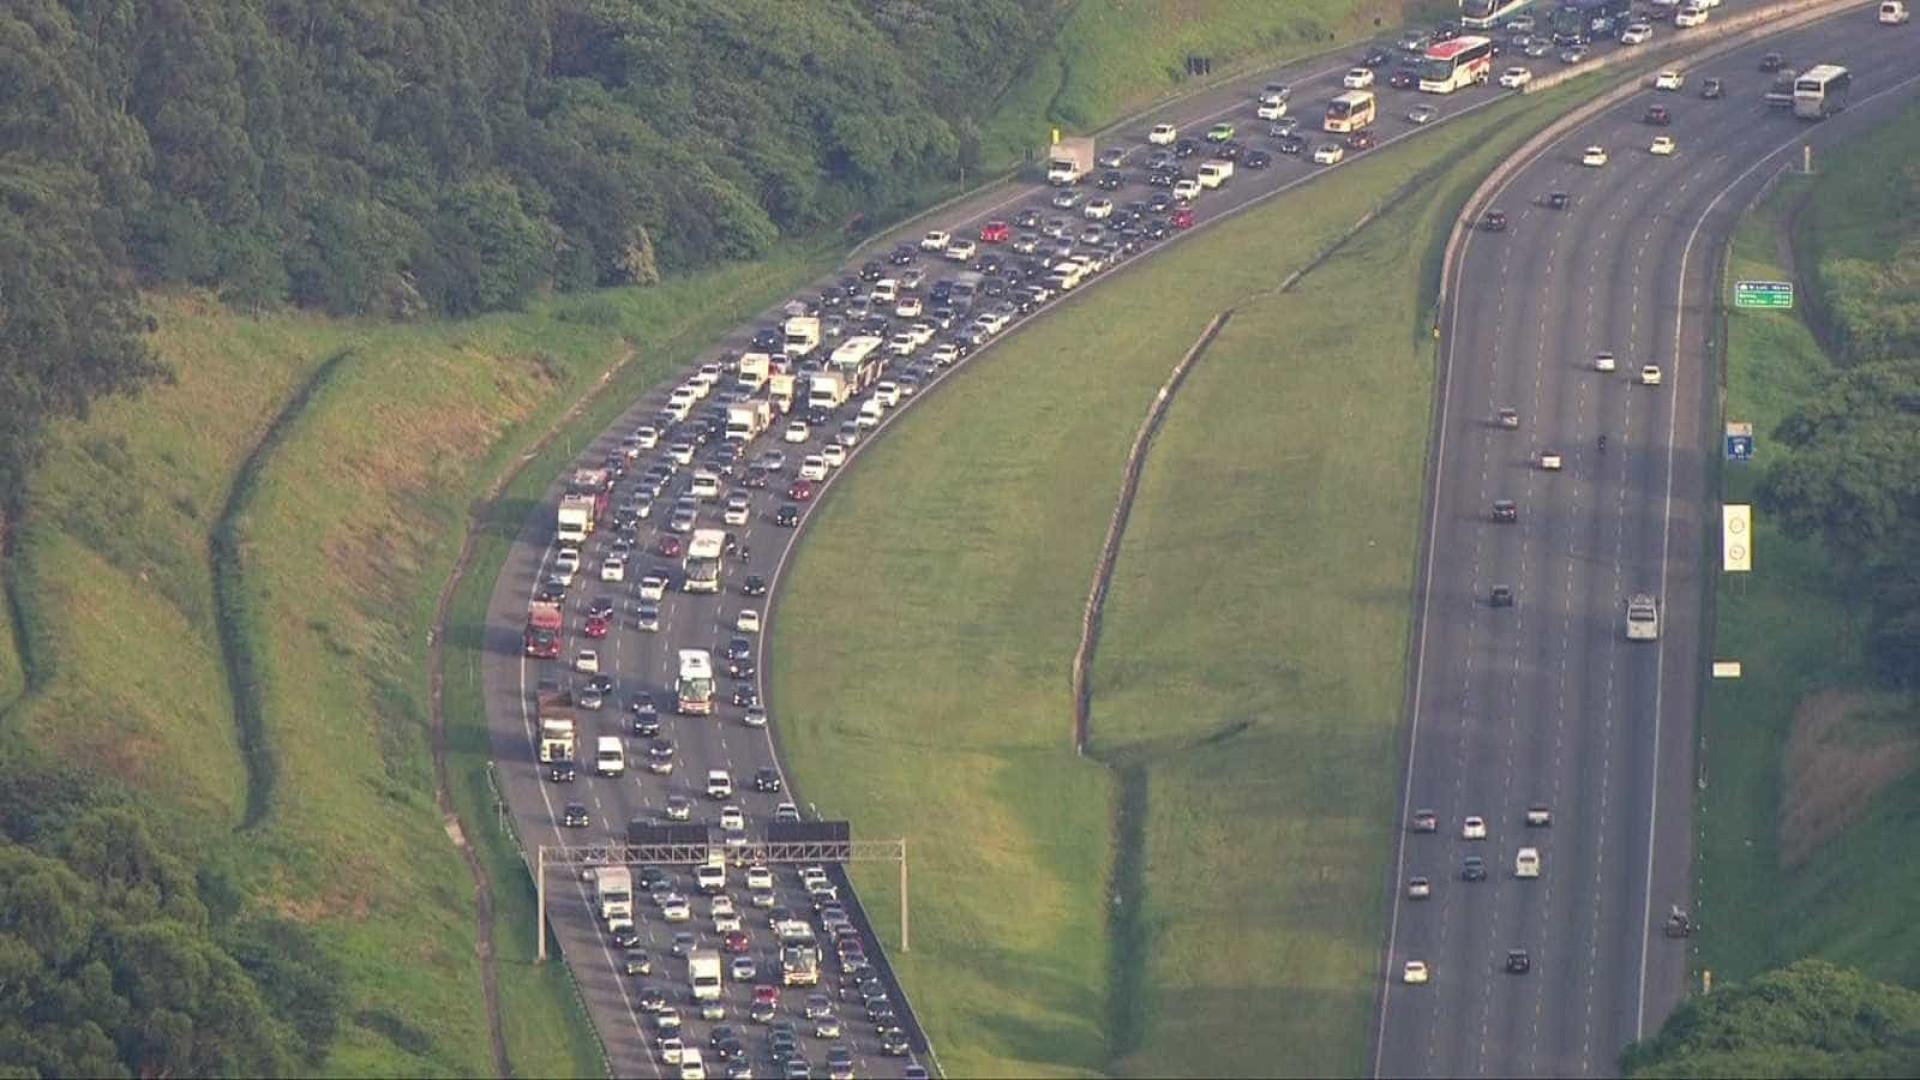 SP terá tráfego intenso nas rodovias na volta do feriadão